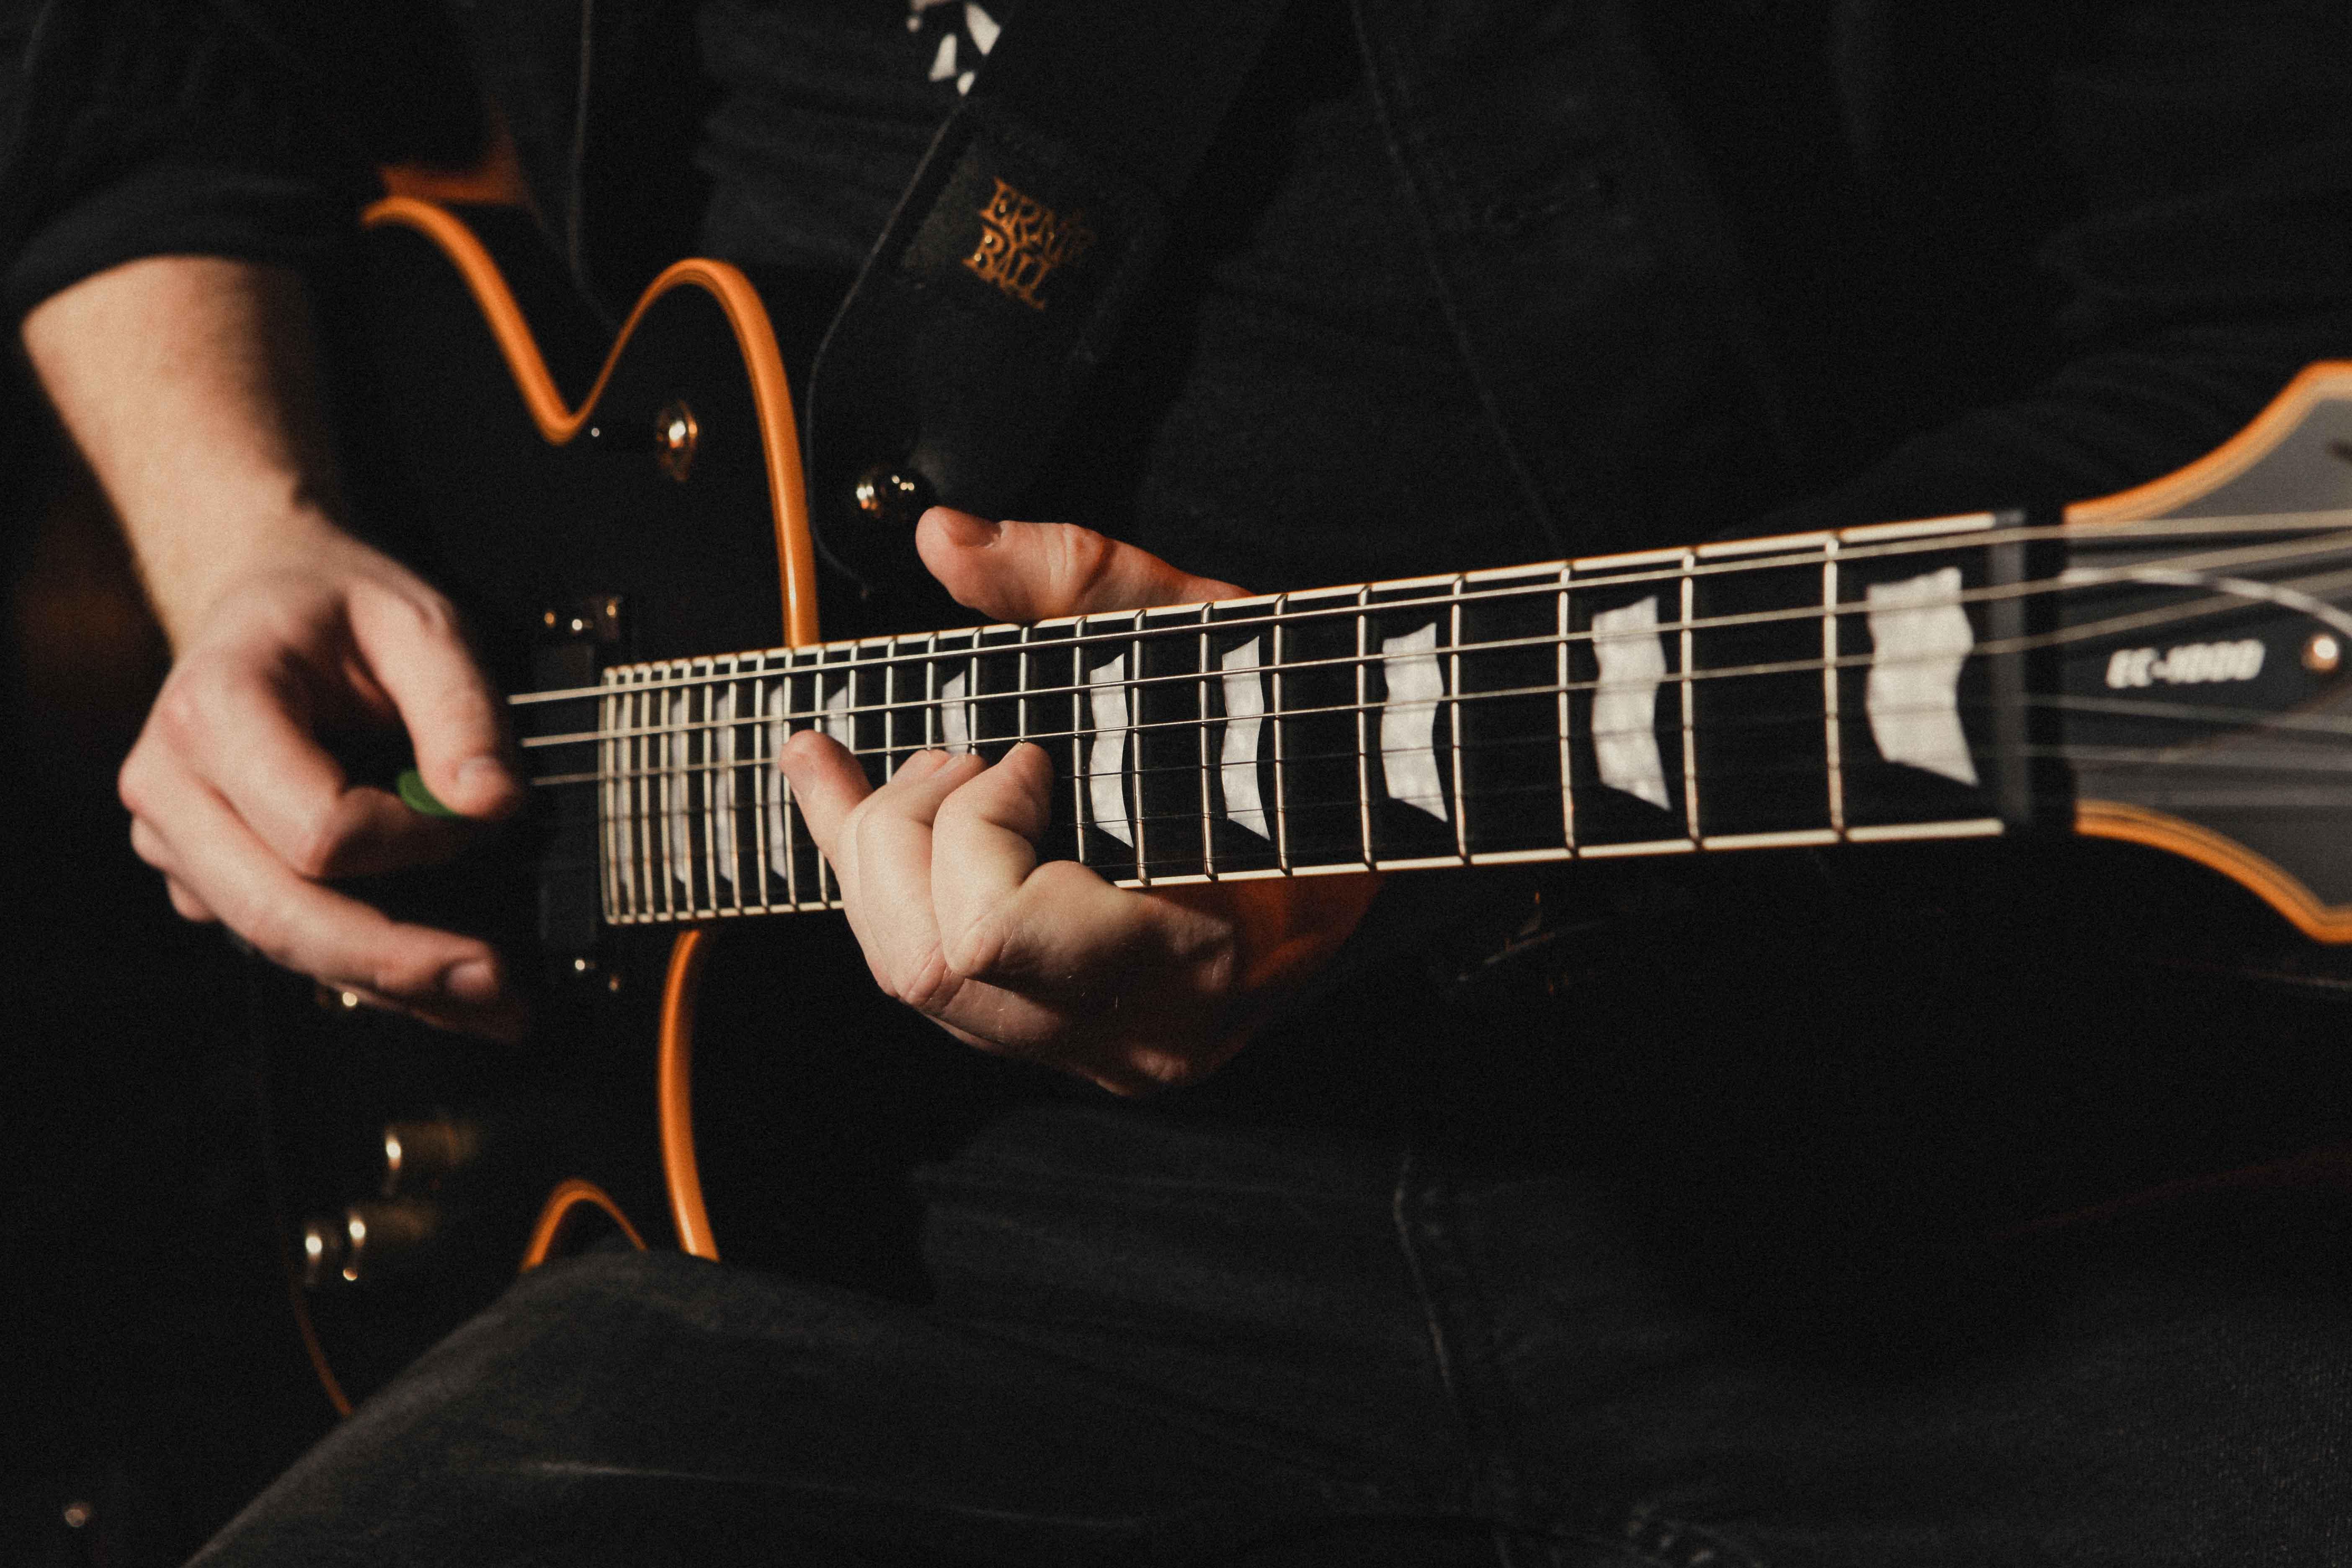 Closeup of someone playing bass guitar